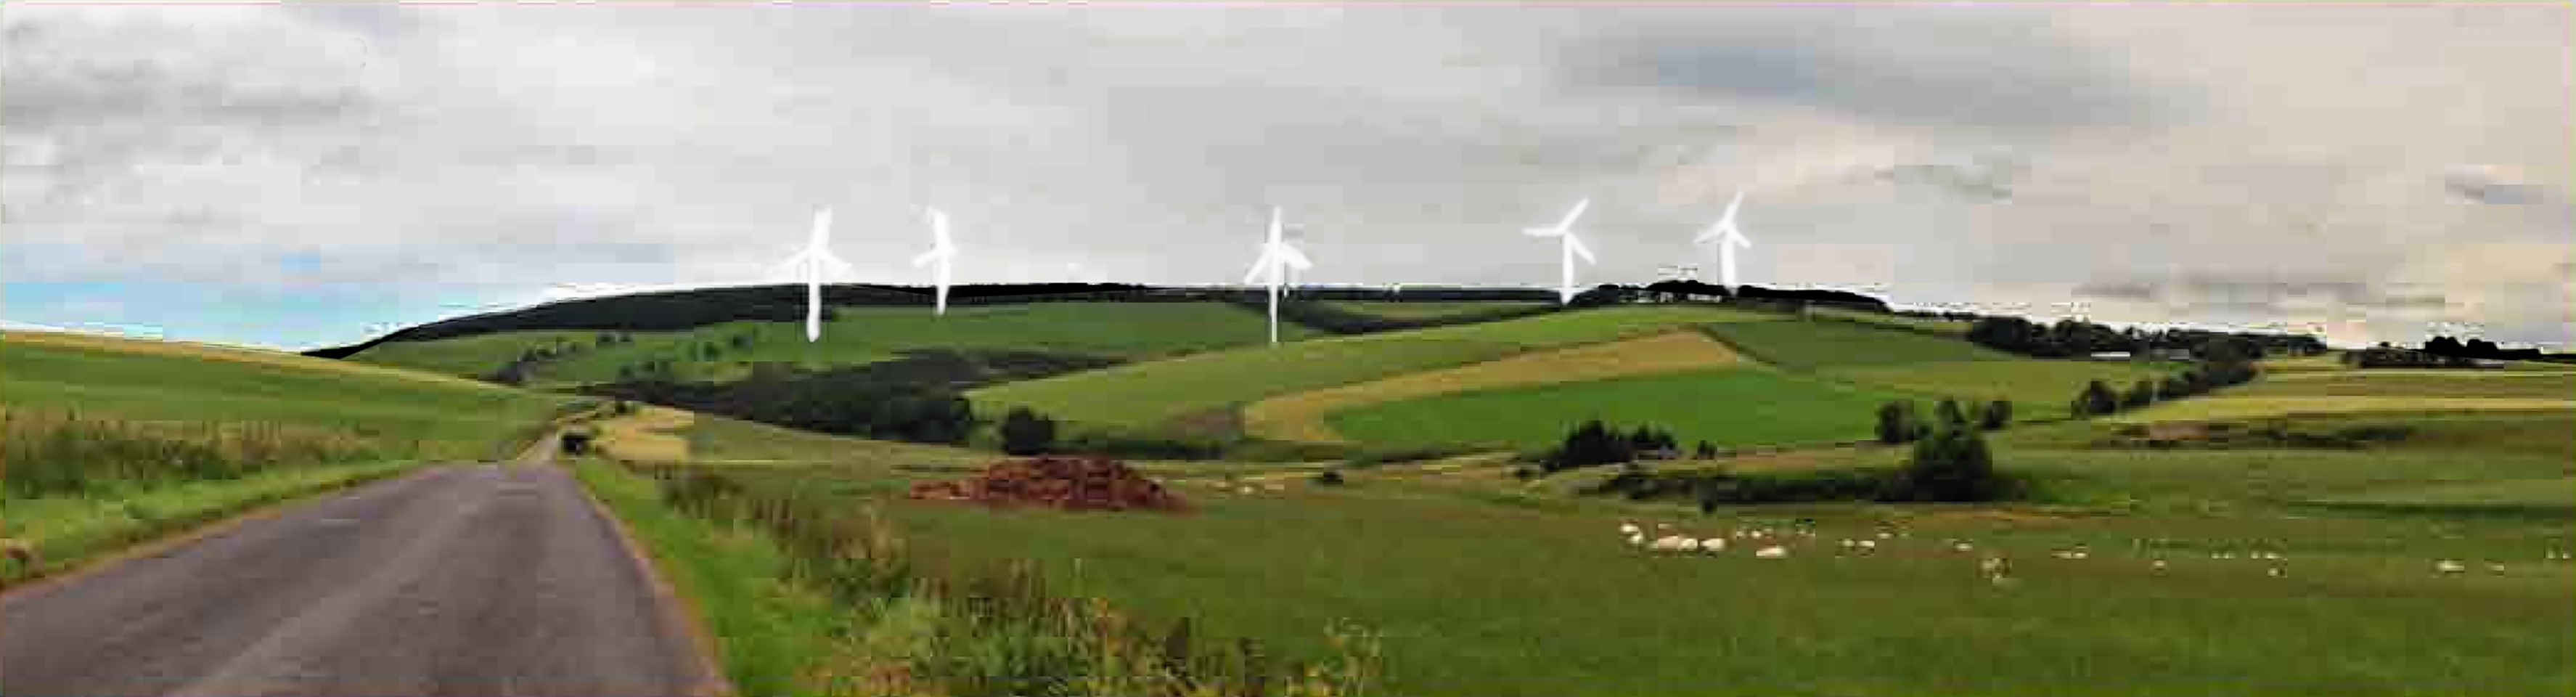 Edintore Wind Farm.